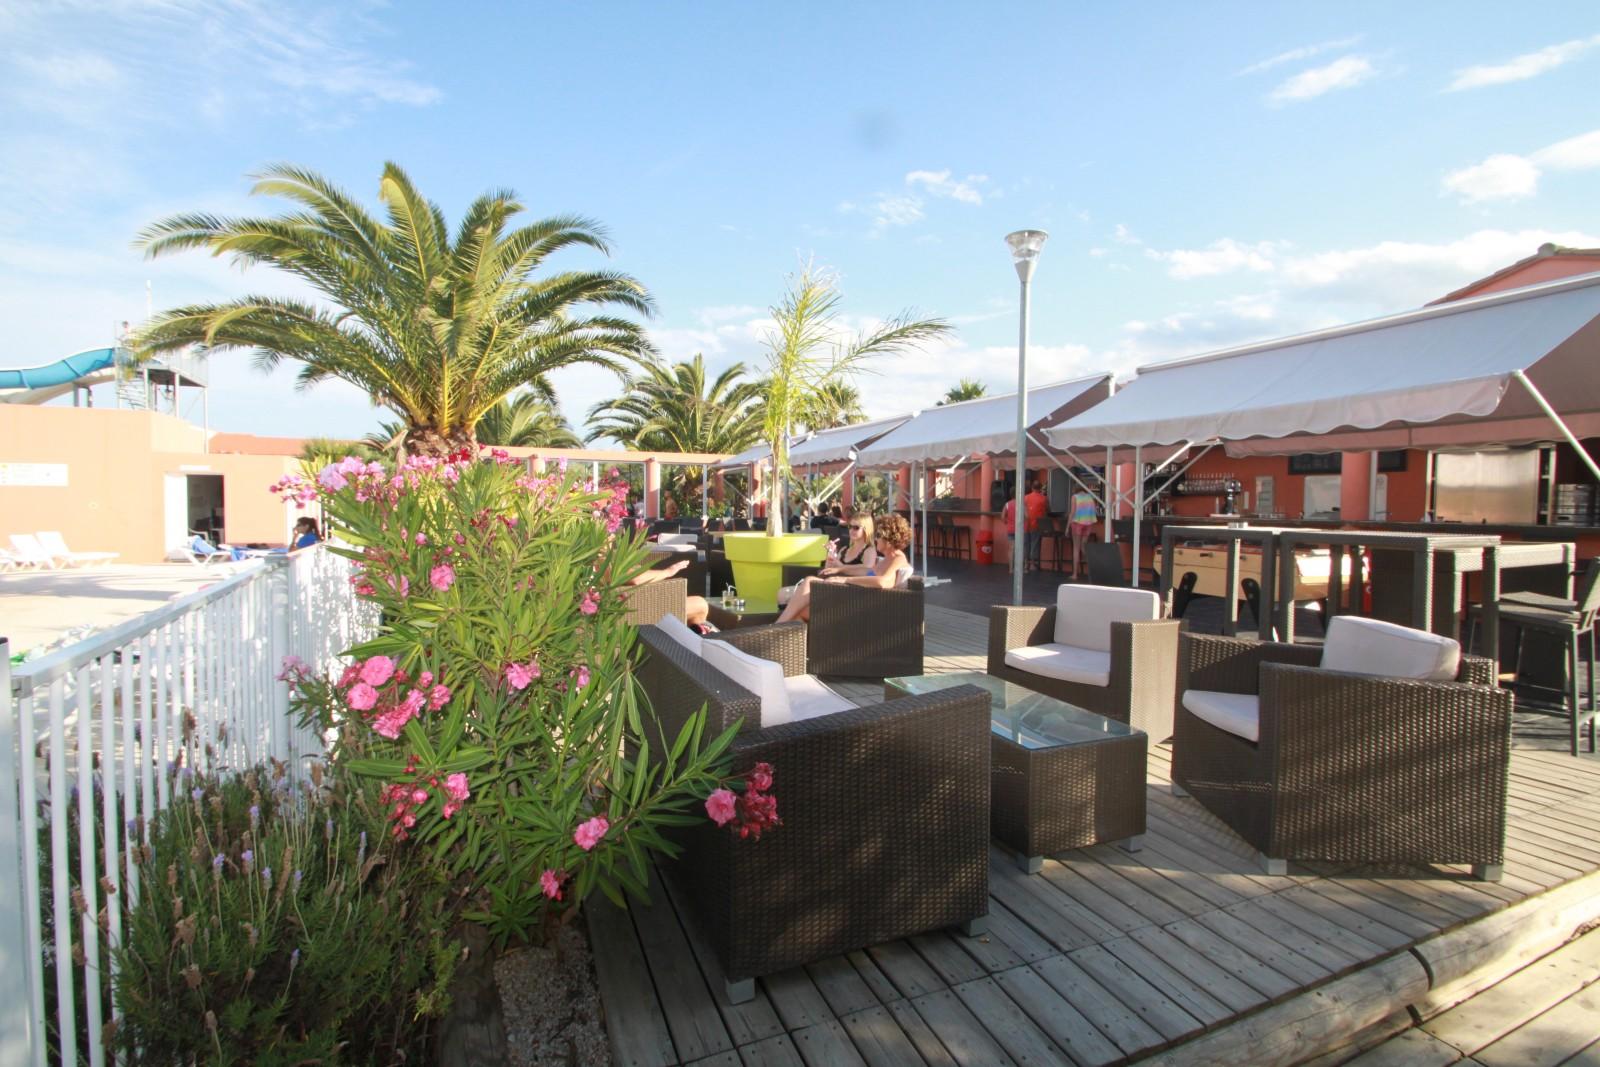 Cafe Del Mar Argeles